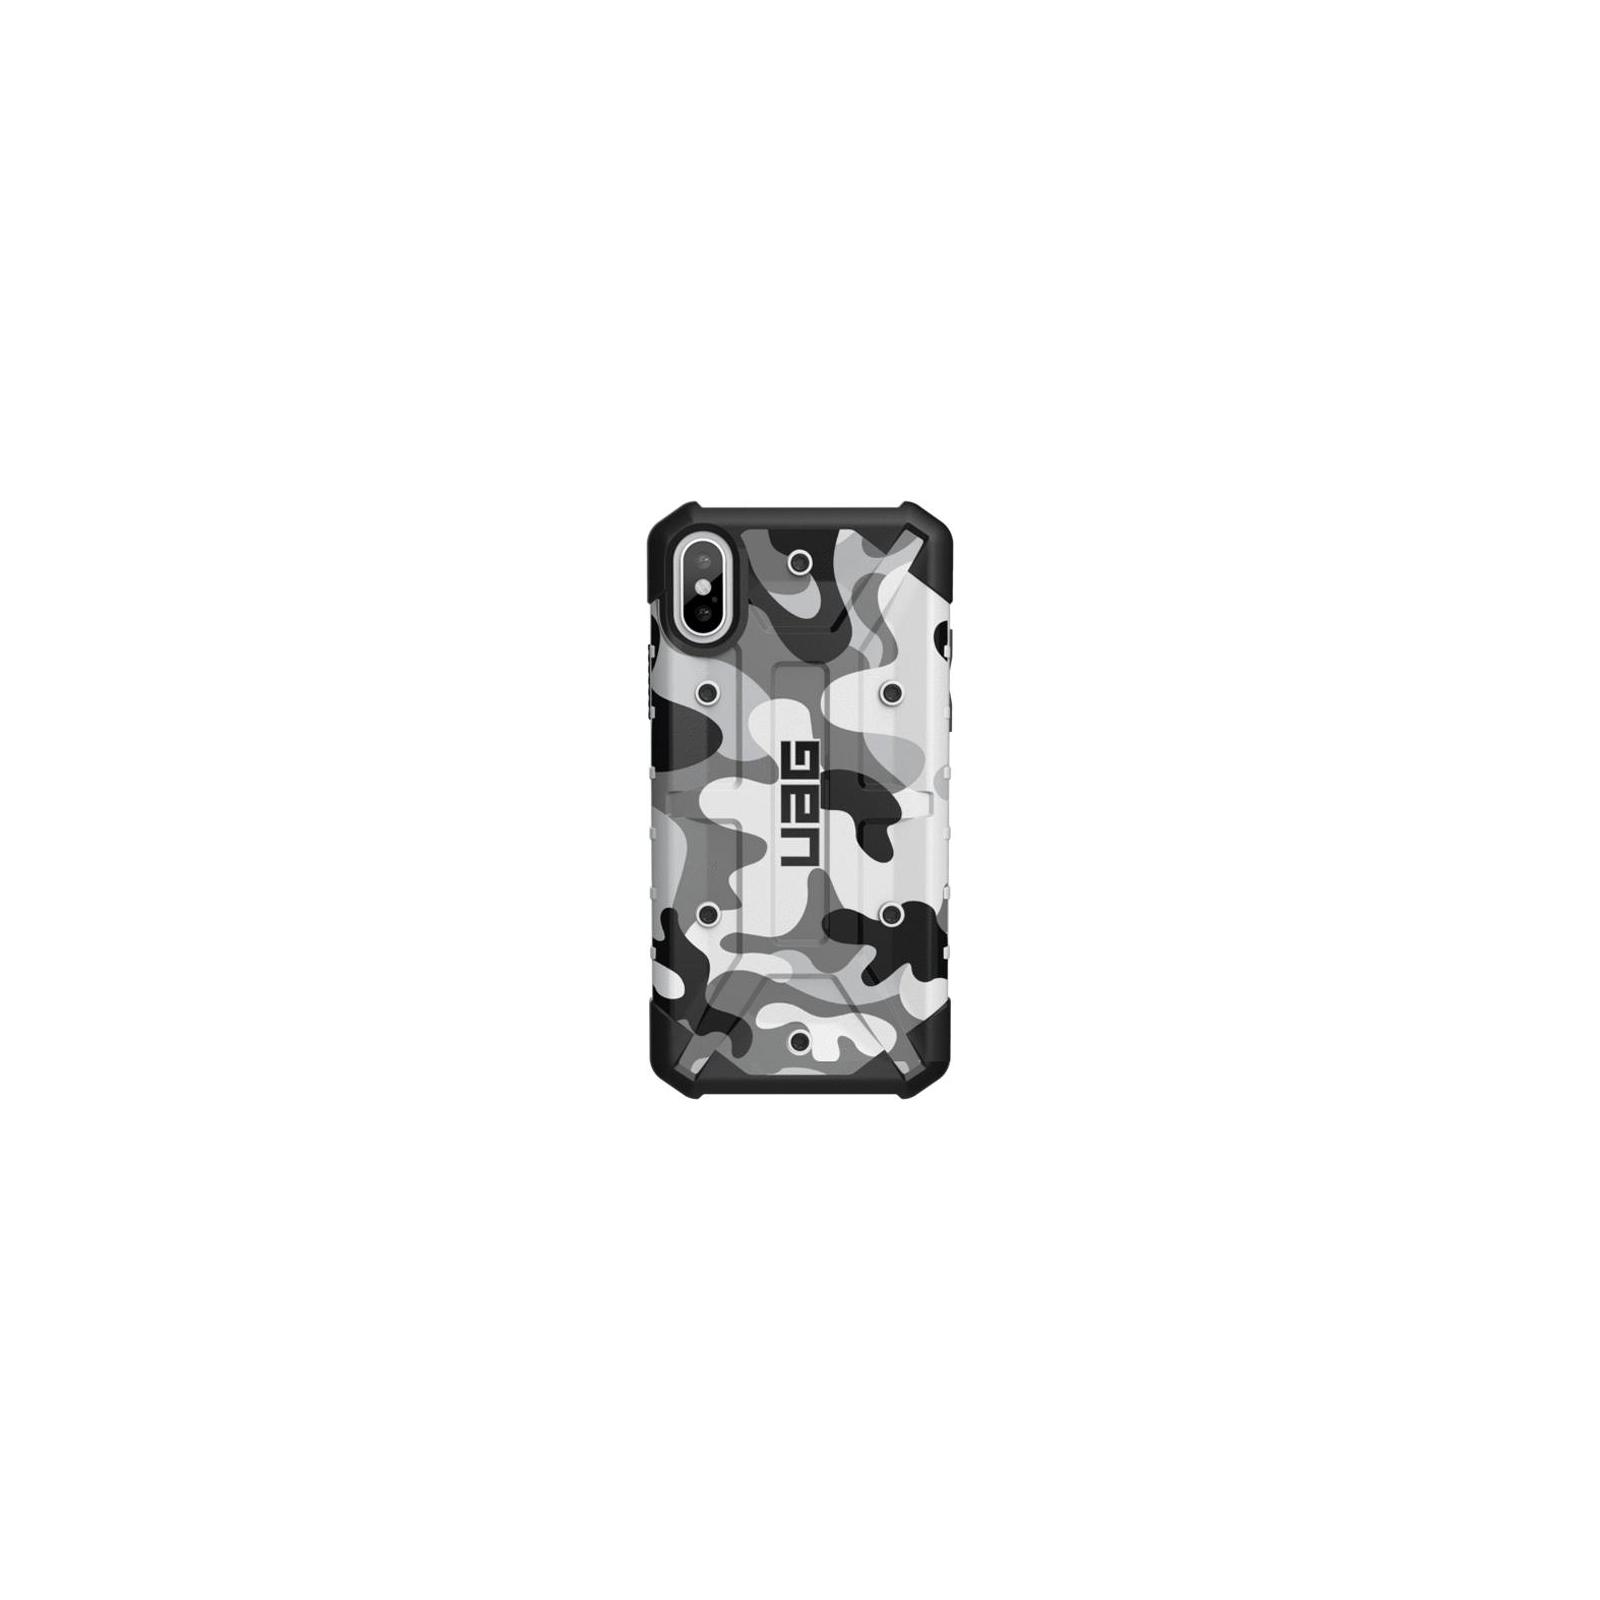 Чехол для моб. телефона UAG iPhone X Pathfinder Camo Gray/White (IPHX-A-WC)